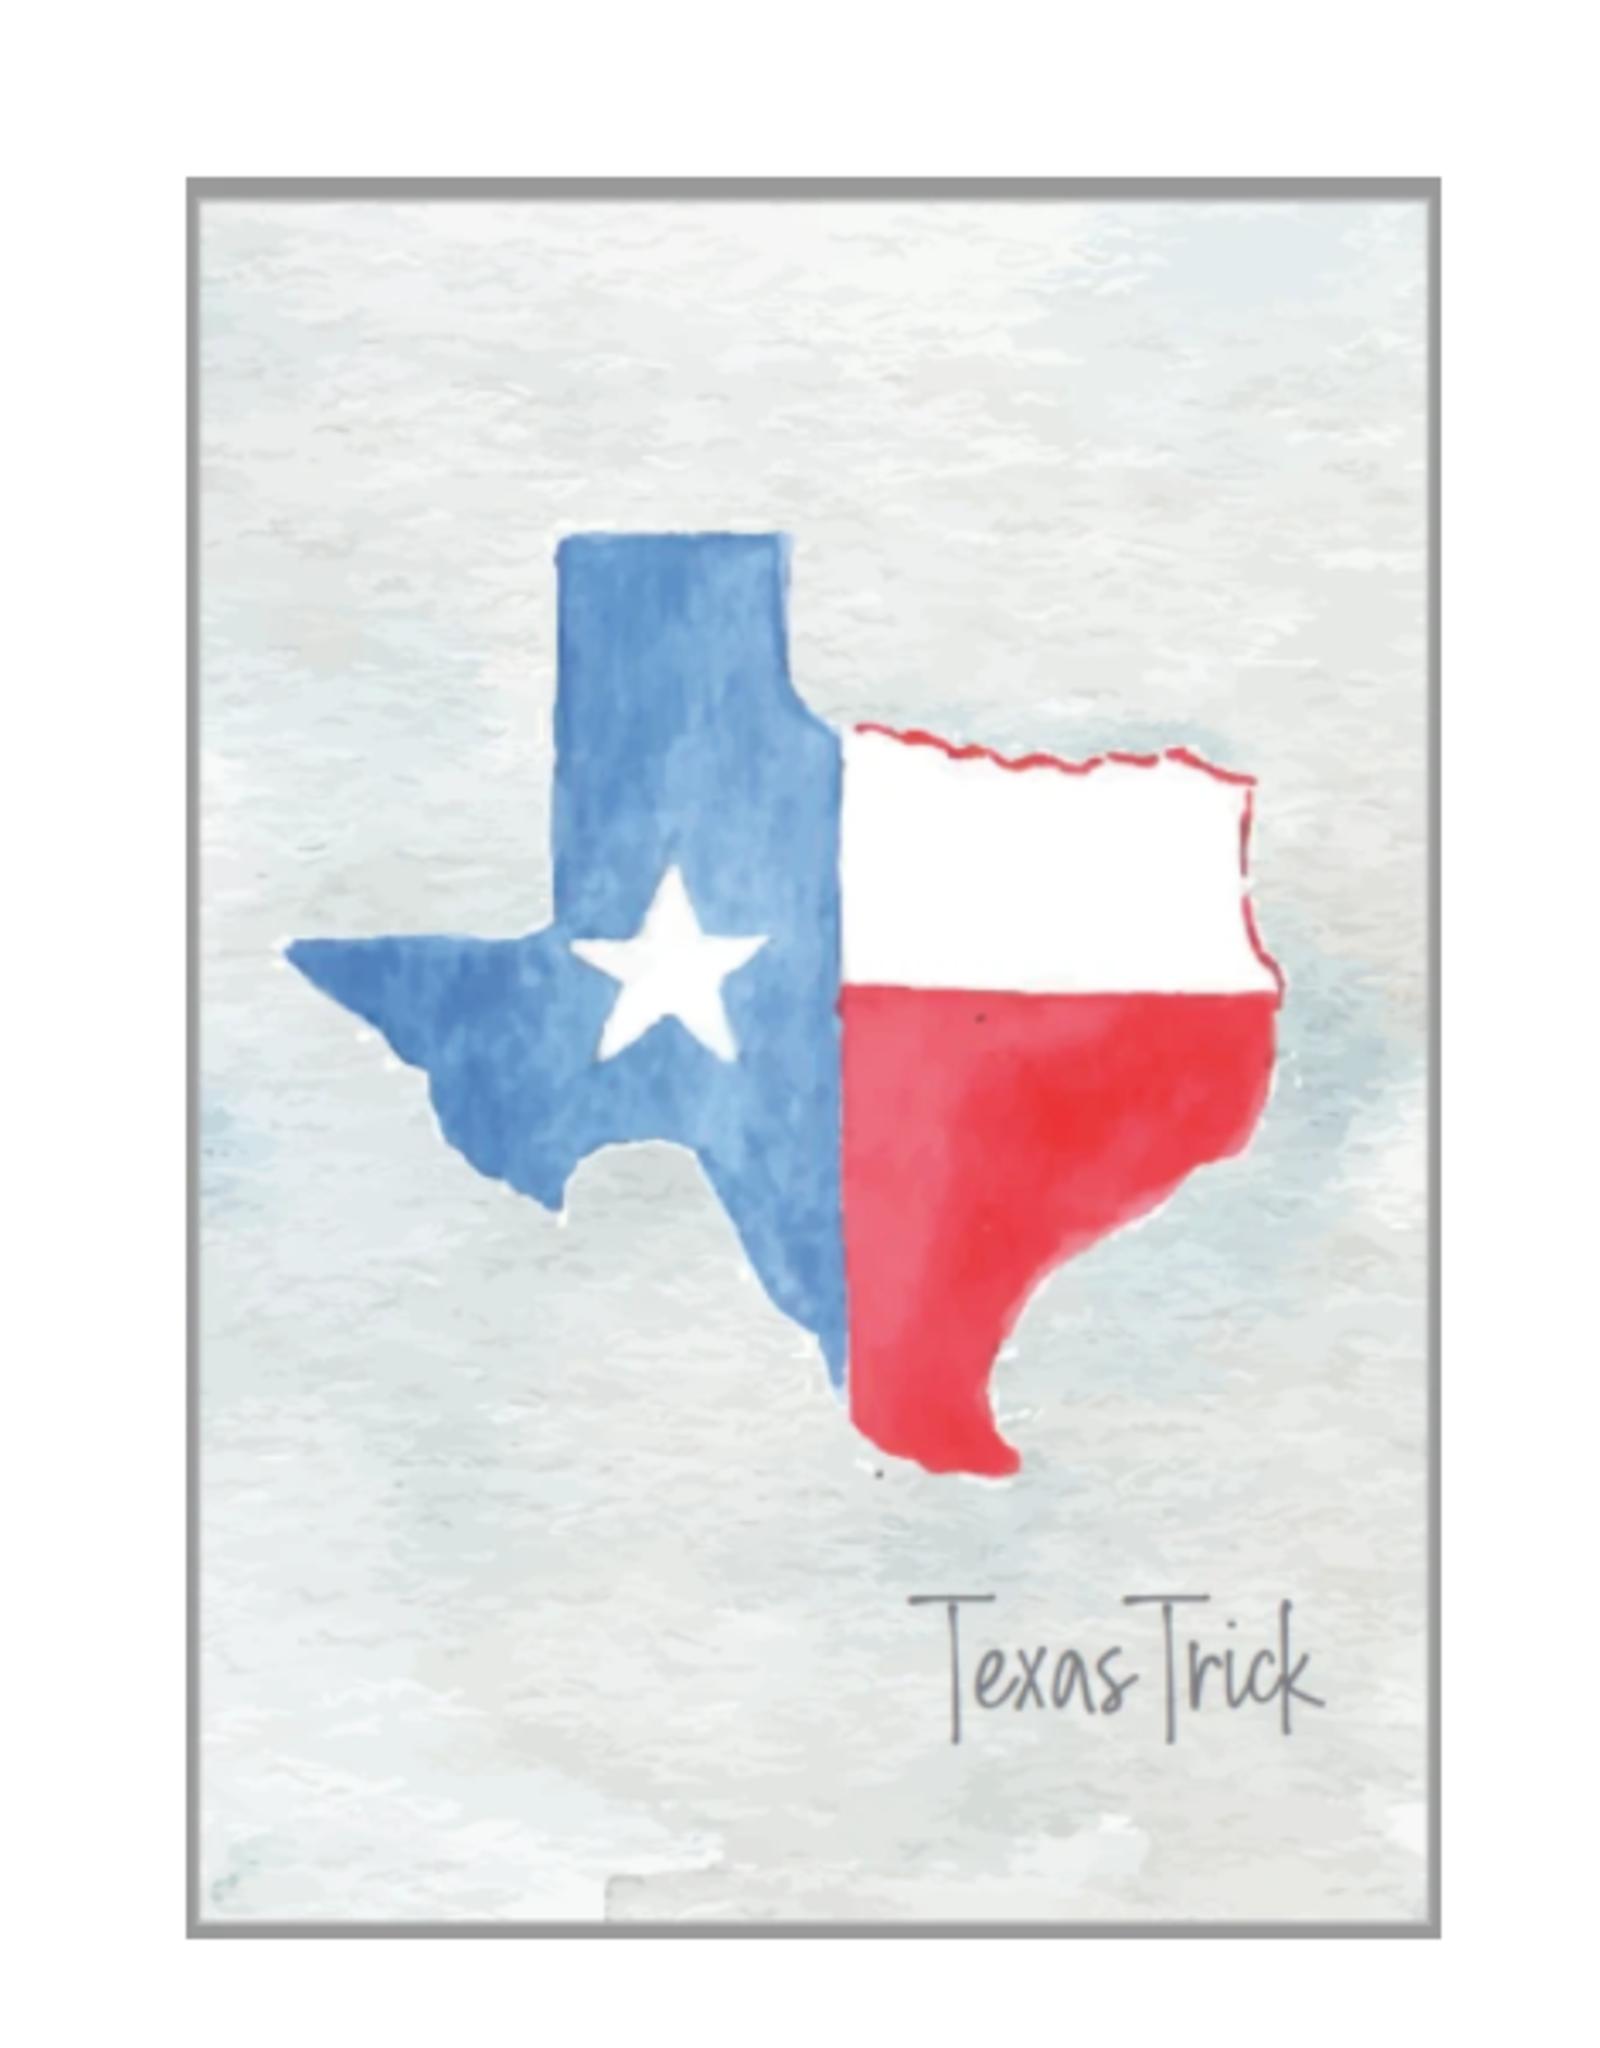 Texas Trick